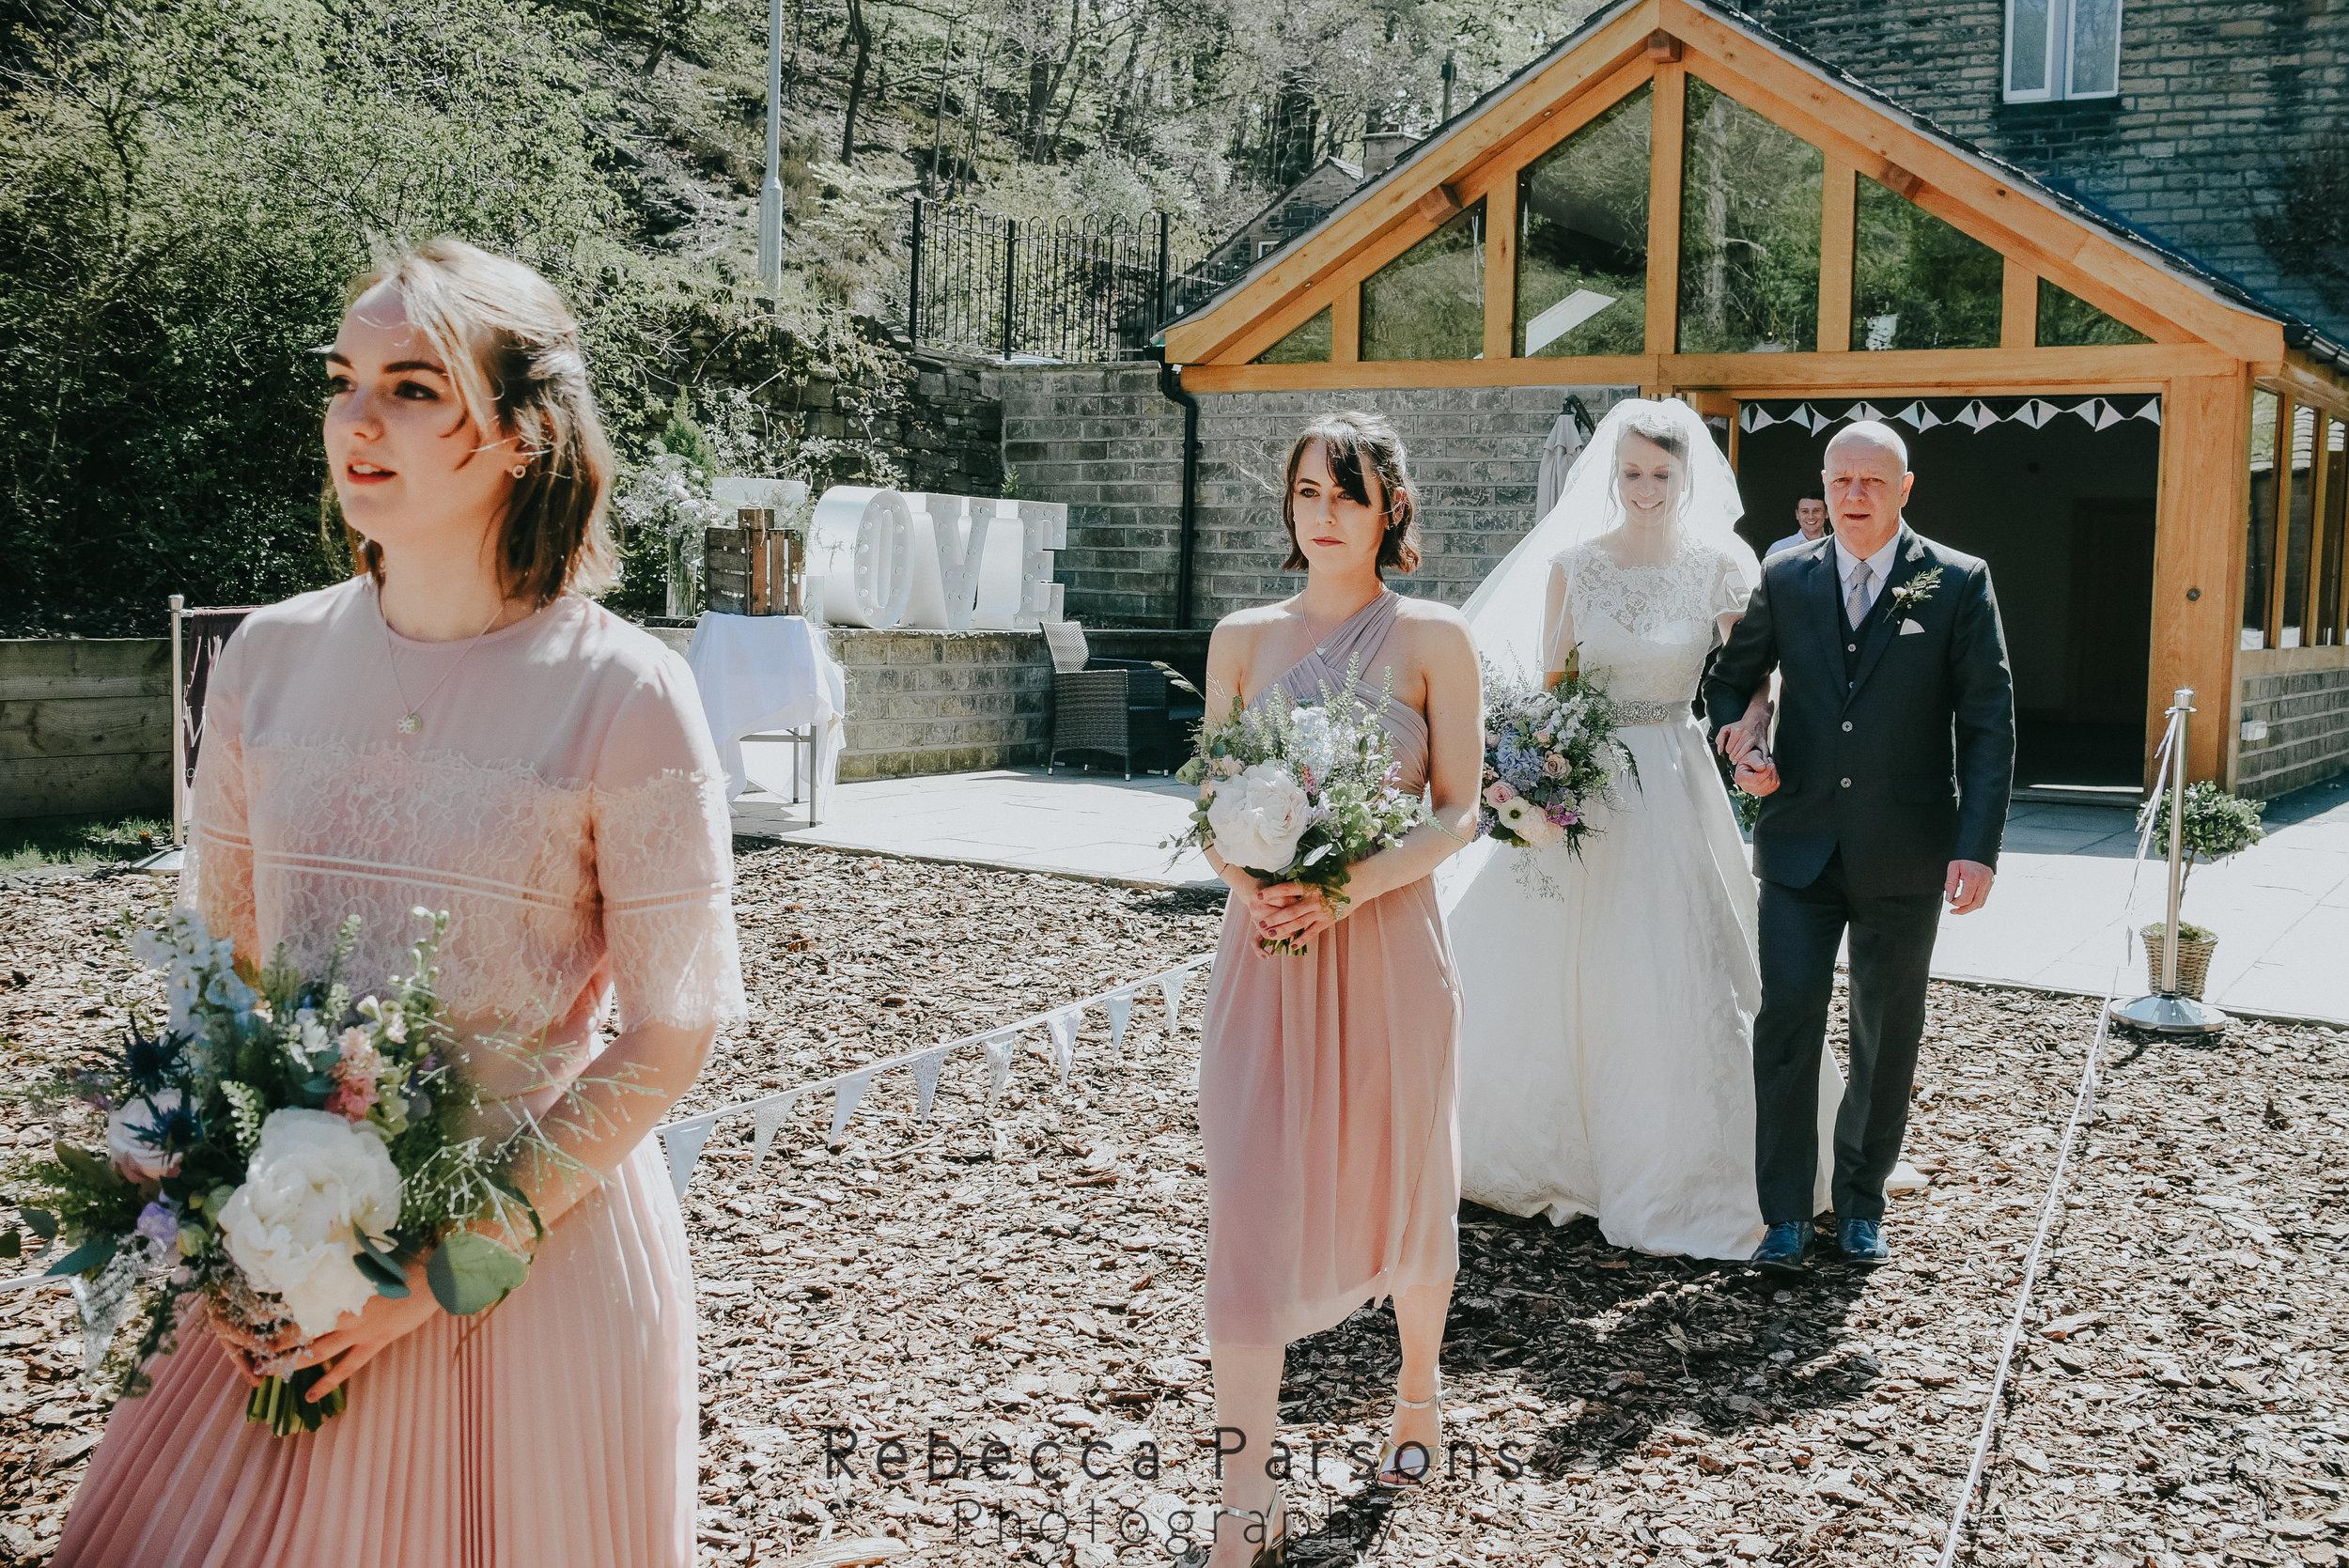 bridal party walking down aisle outdoors